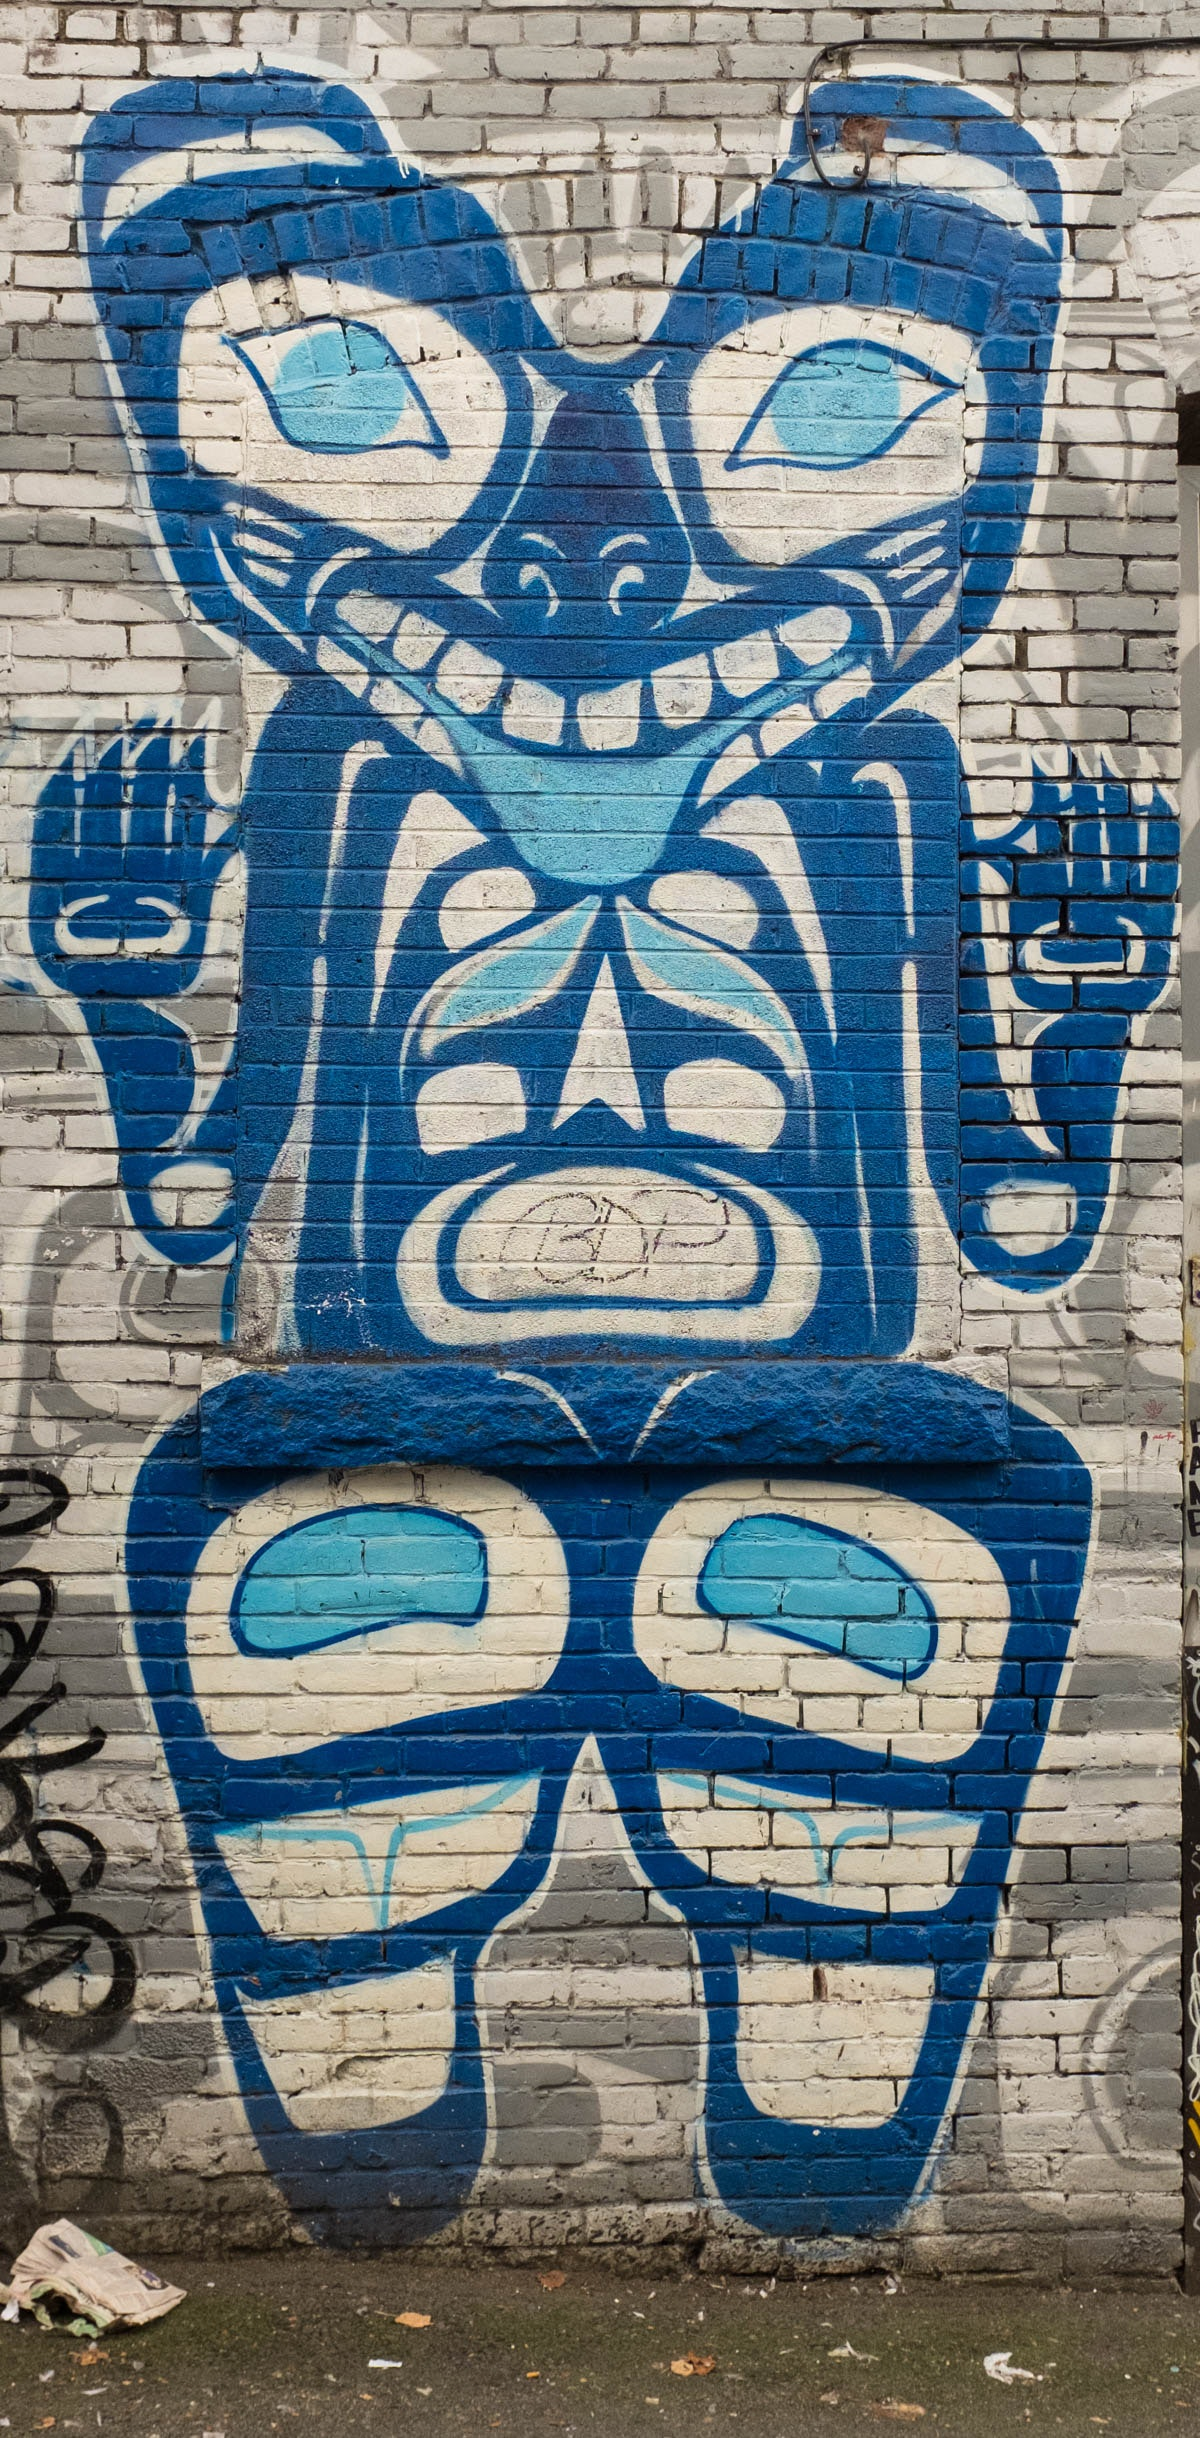 Gastown Graffiti Project